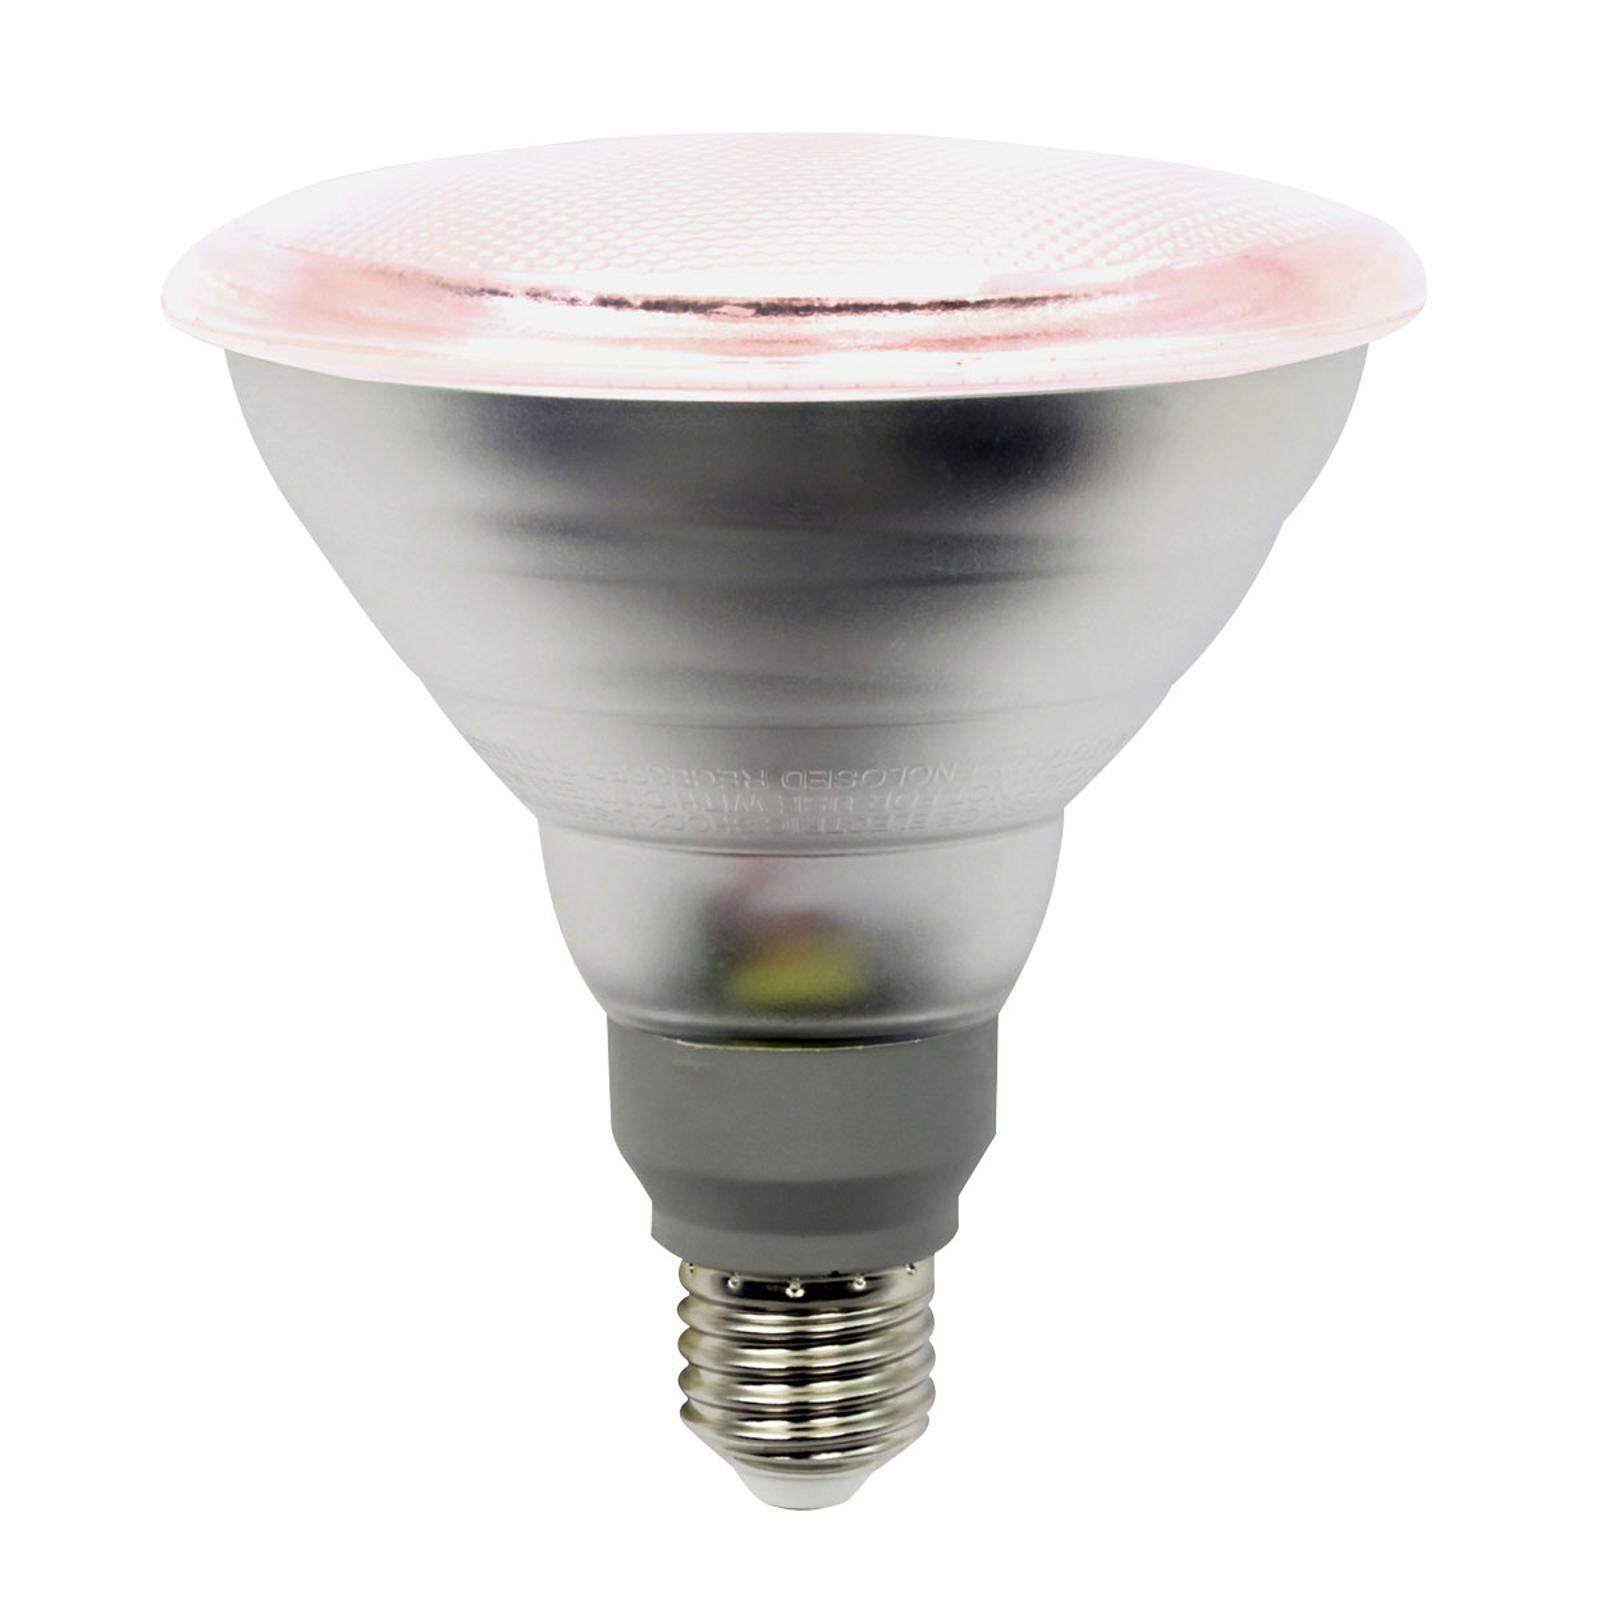 LED-Pflanzenlampe E27 PAR38 12W 50° Abstrahlwinkel